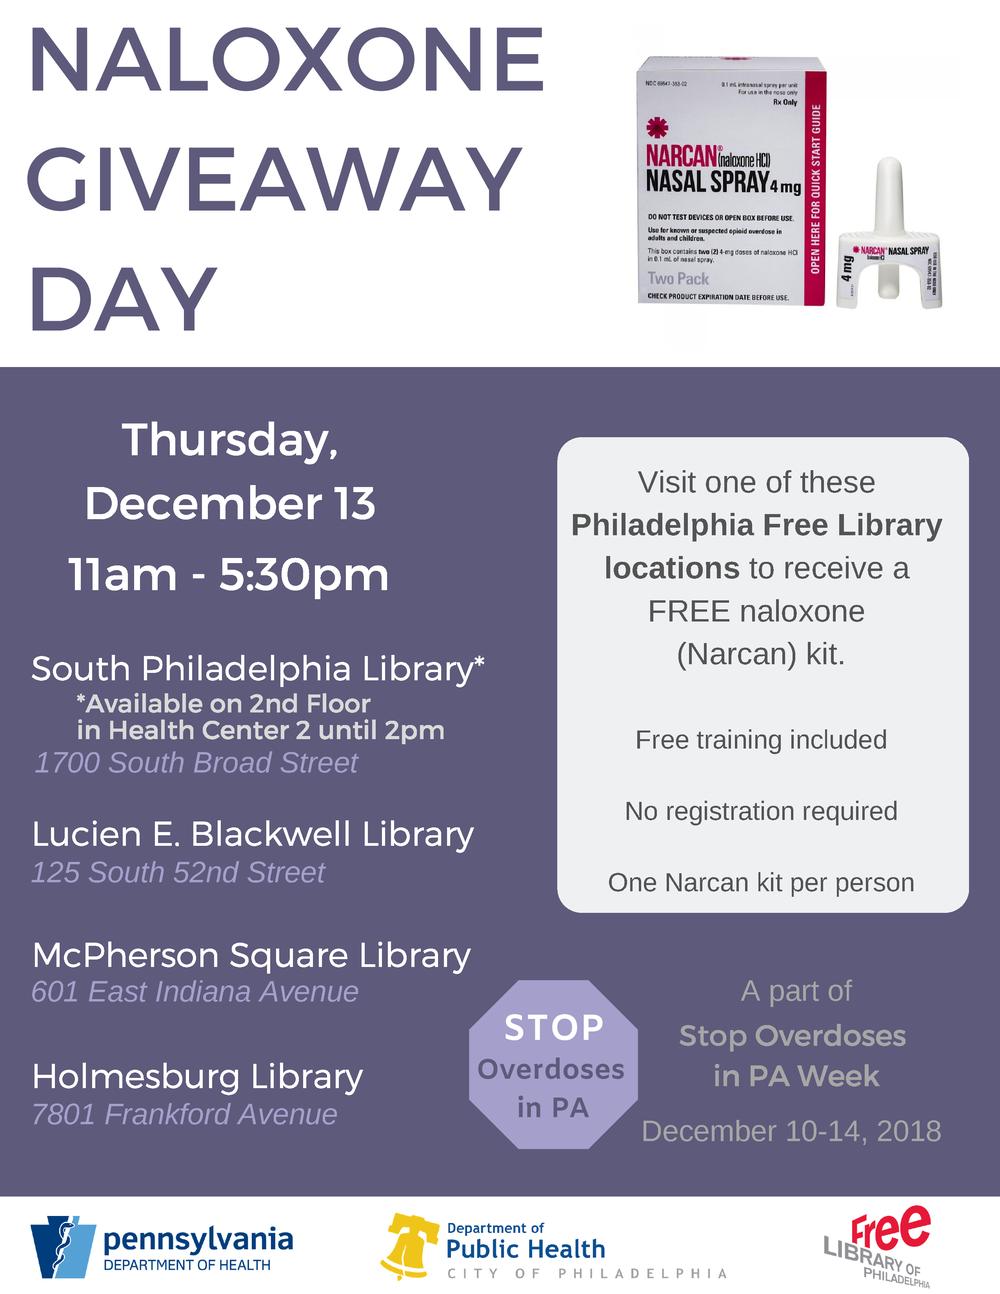 NALOXONE GIVEAWAYDAY - Thursday, December 13th11:00am - 5:30pm